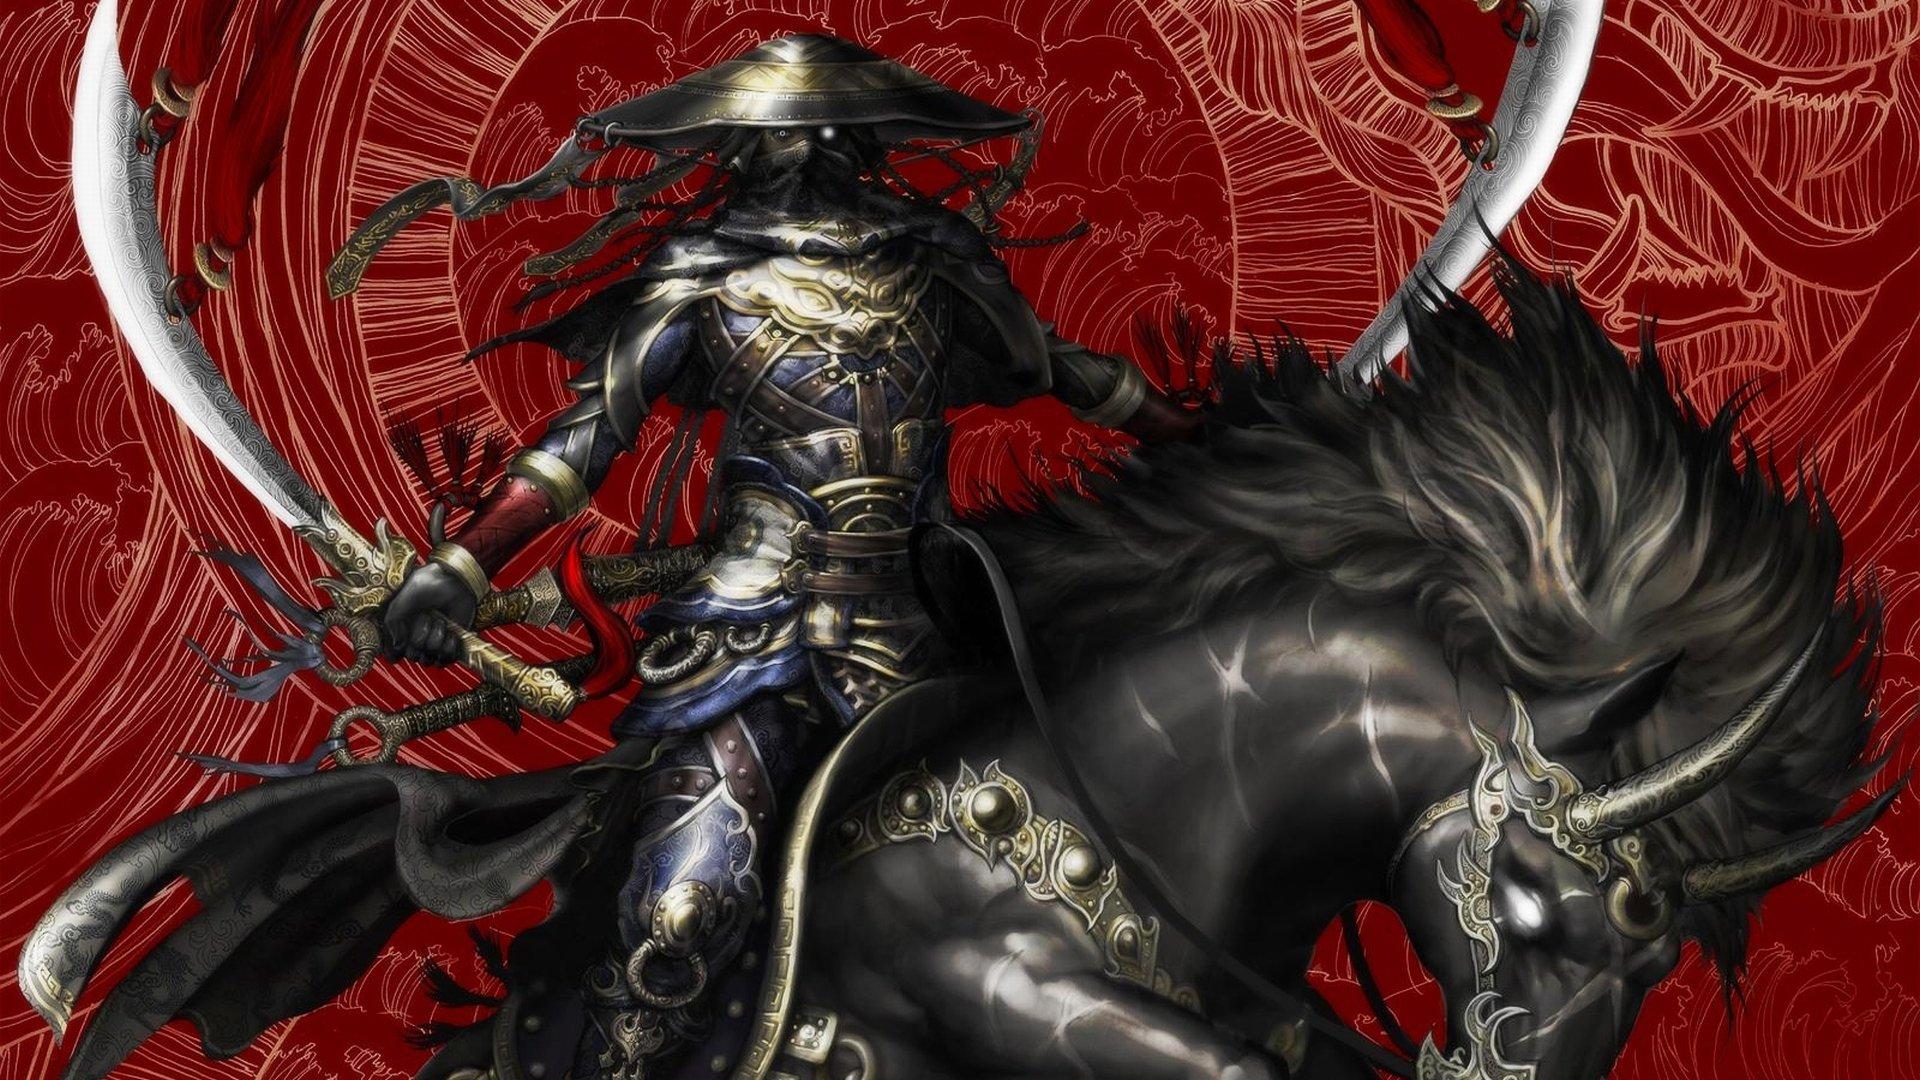 Samurai Hd Wallpaper Background Image 1920x1080 Id 142537